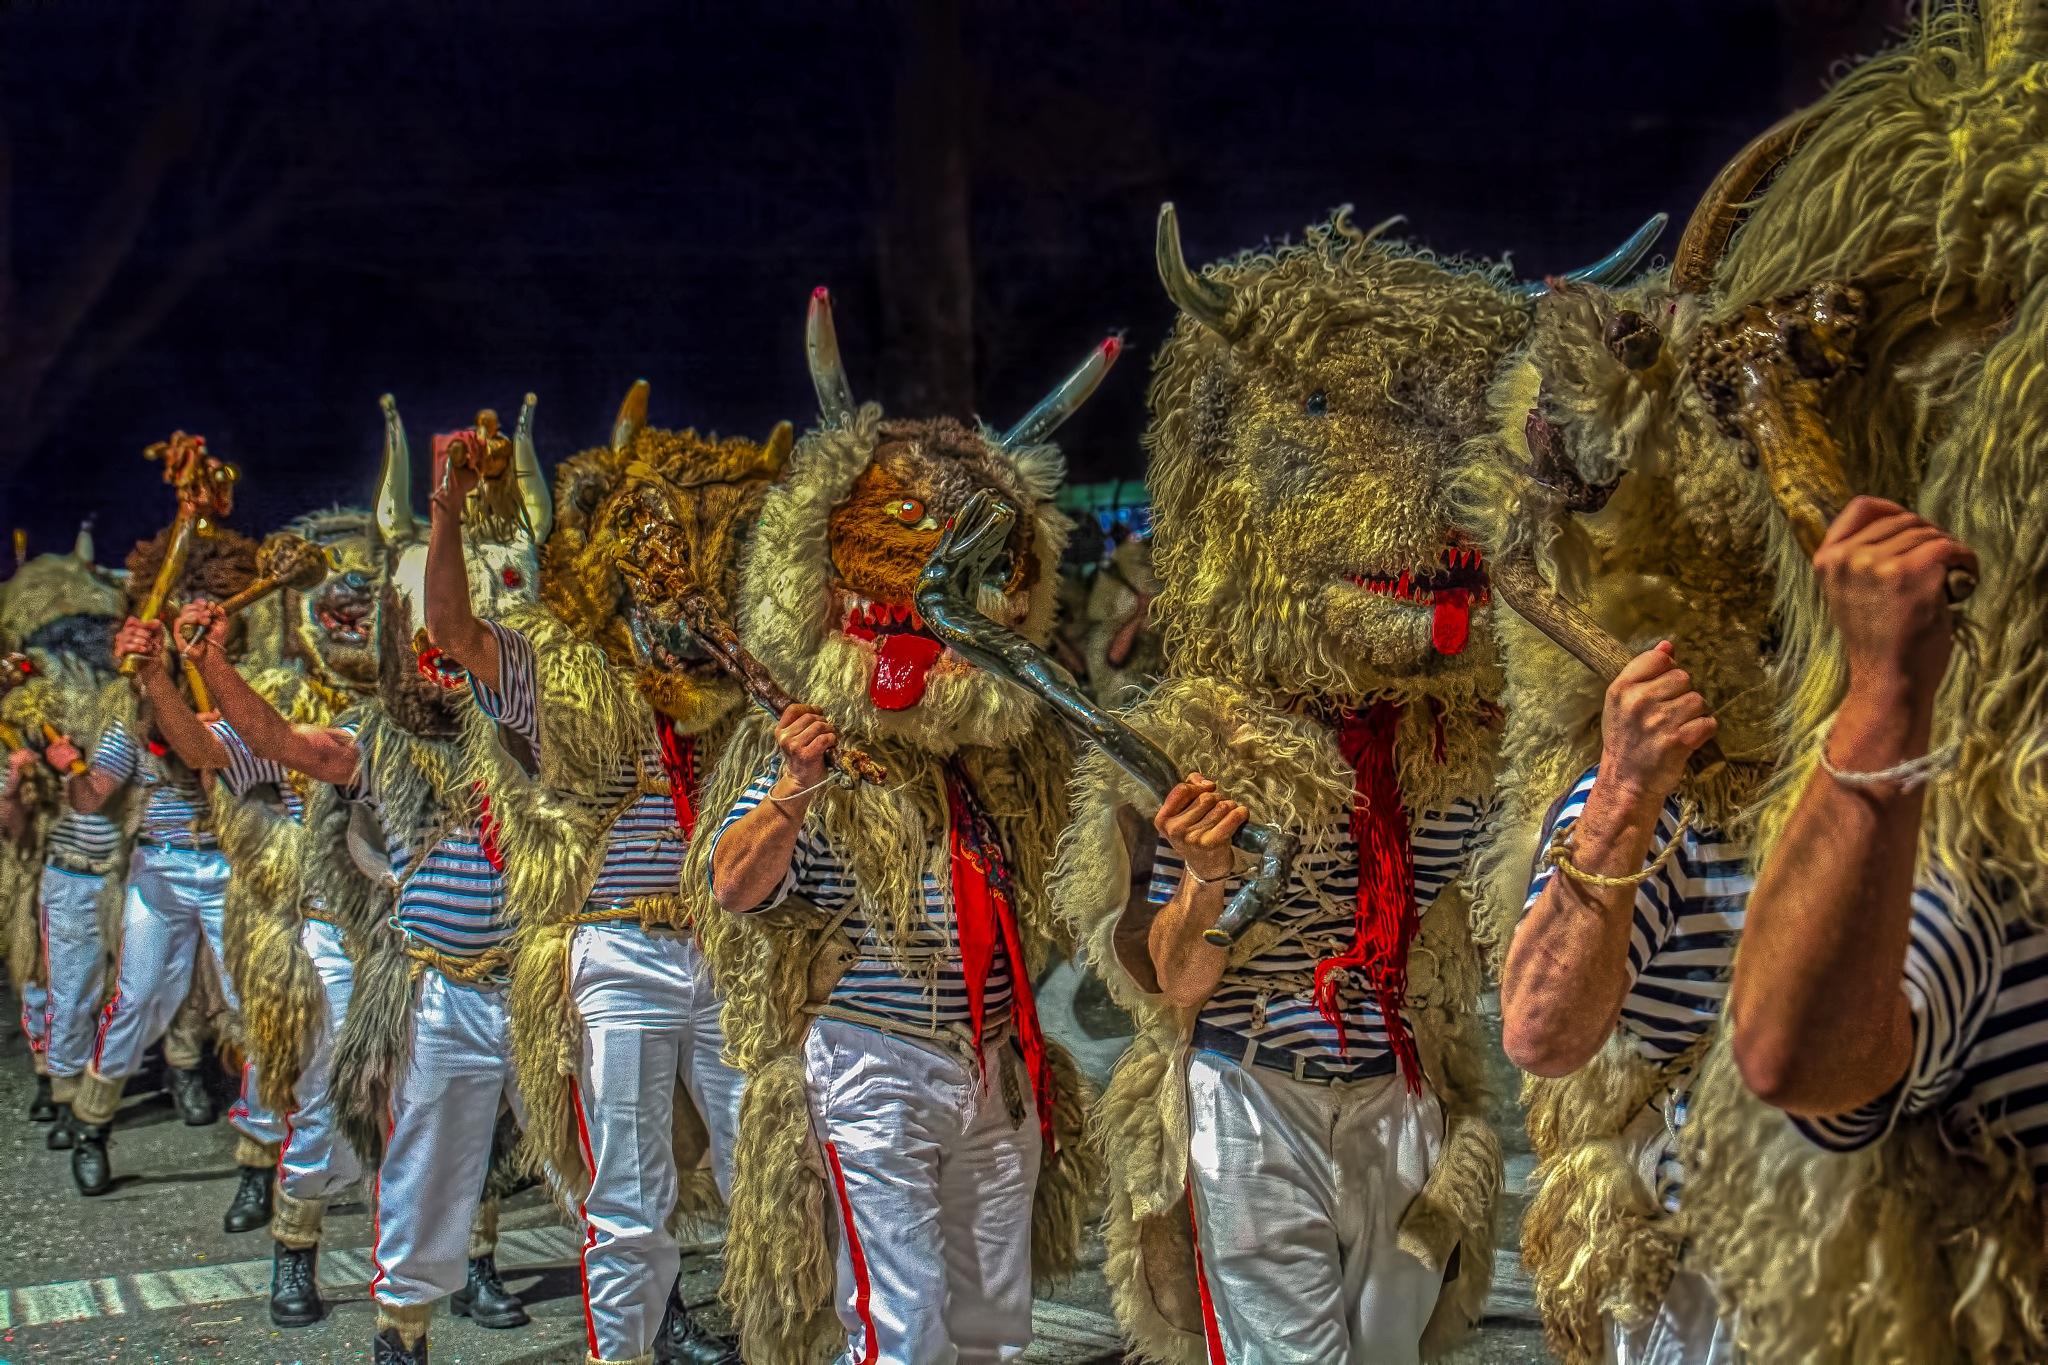 carnival by Eseker RI